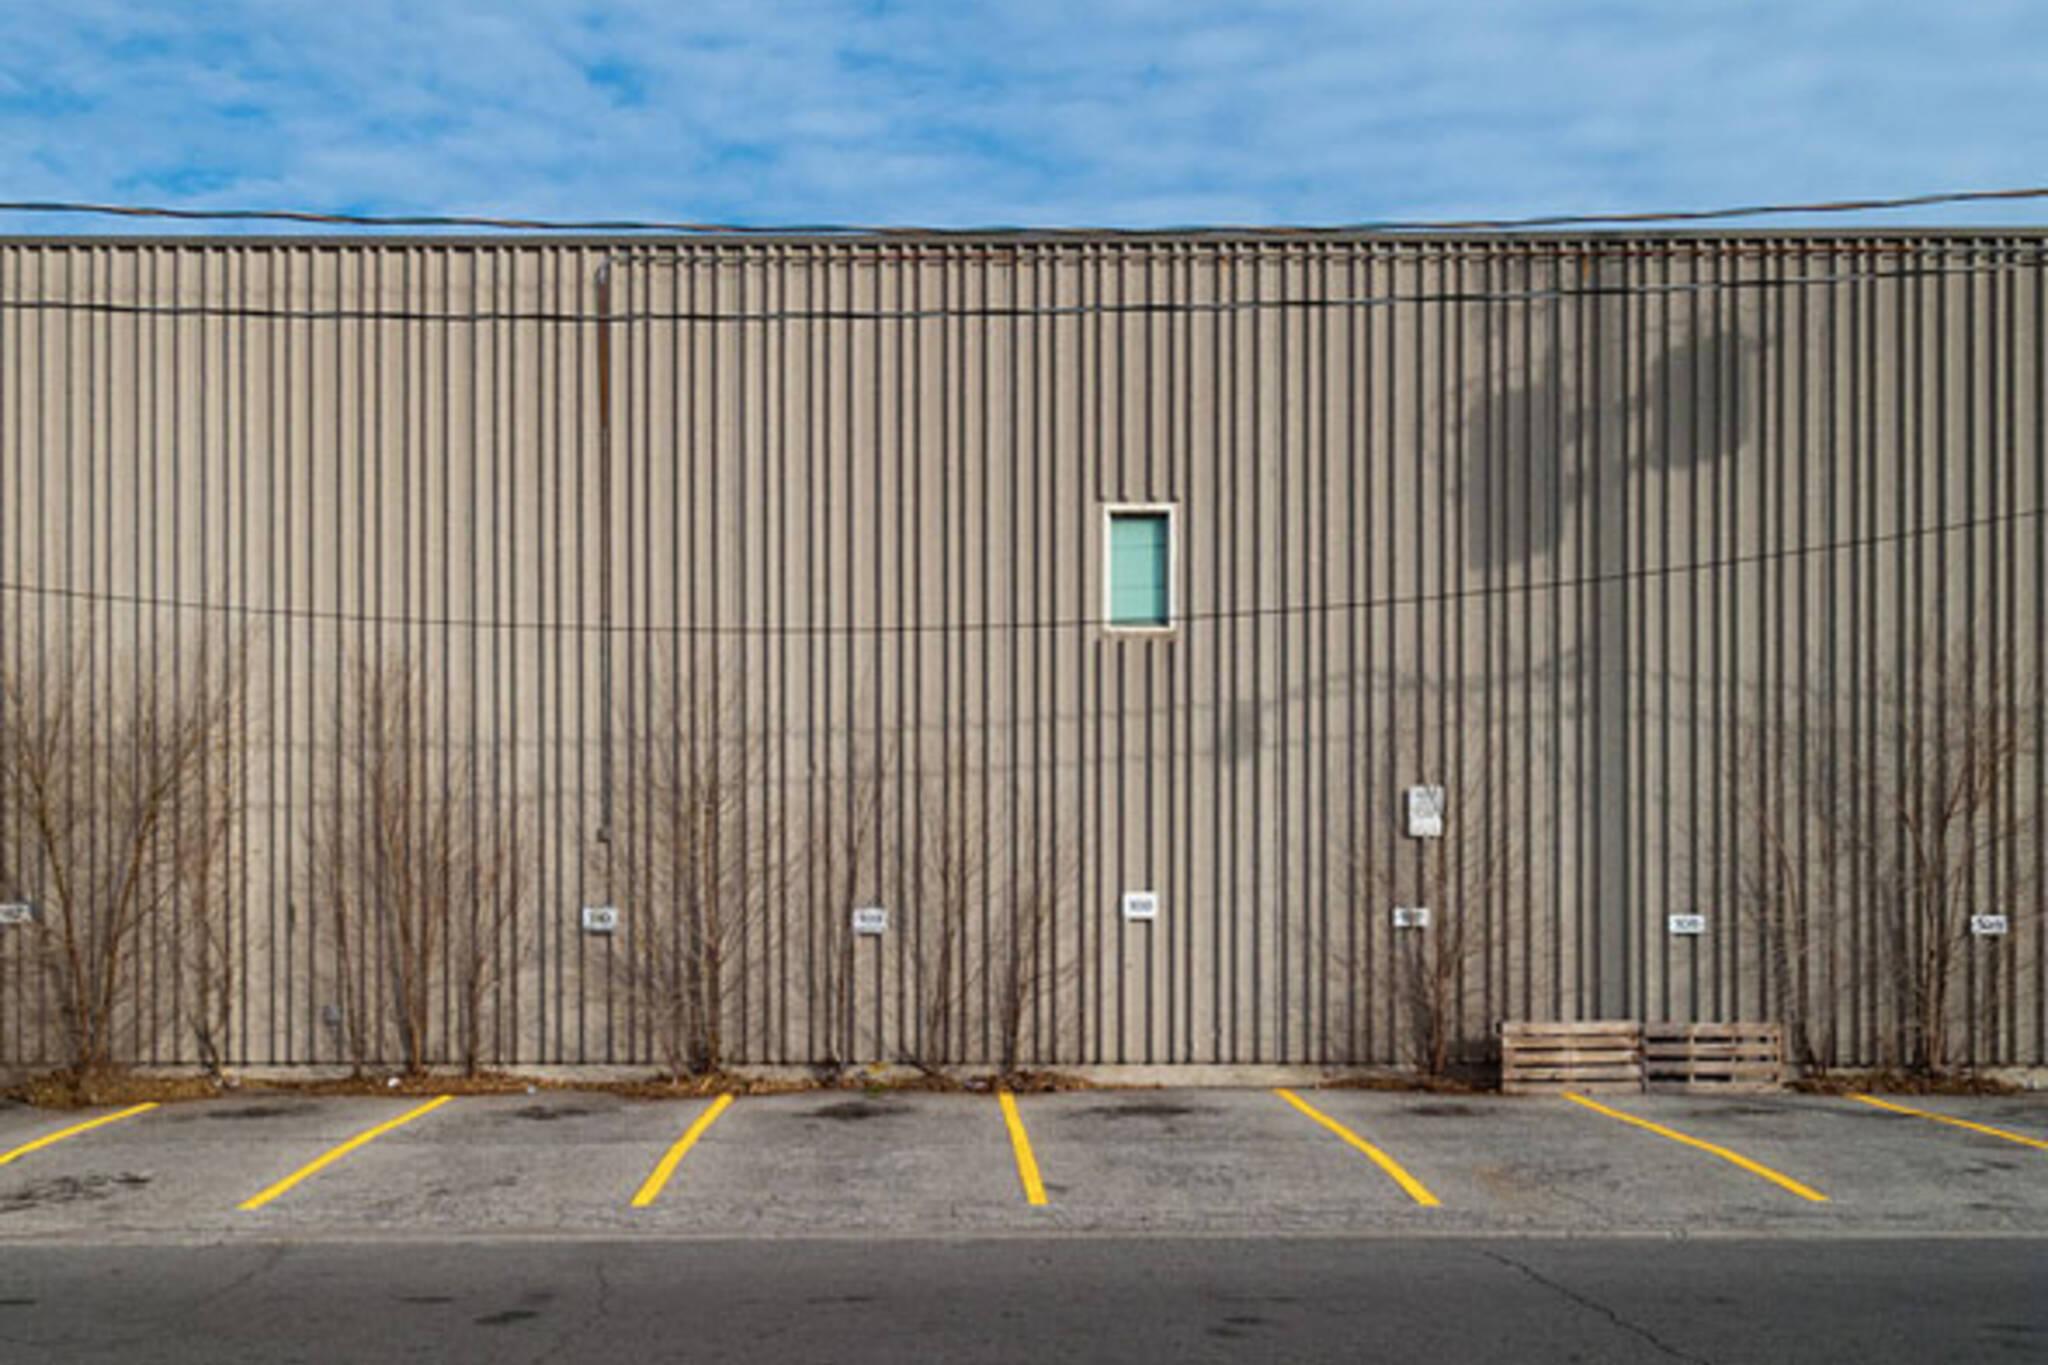 toronto parking spaces